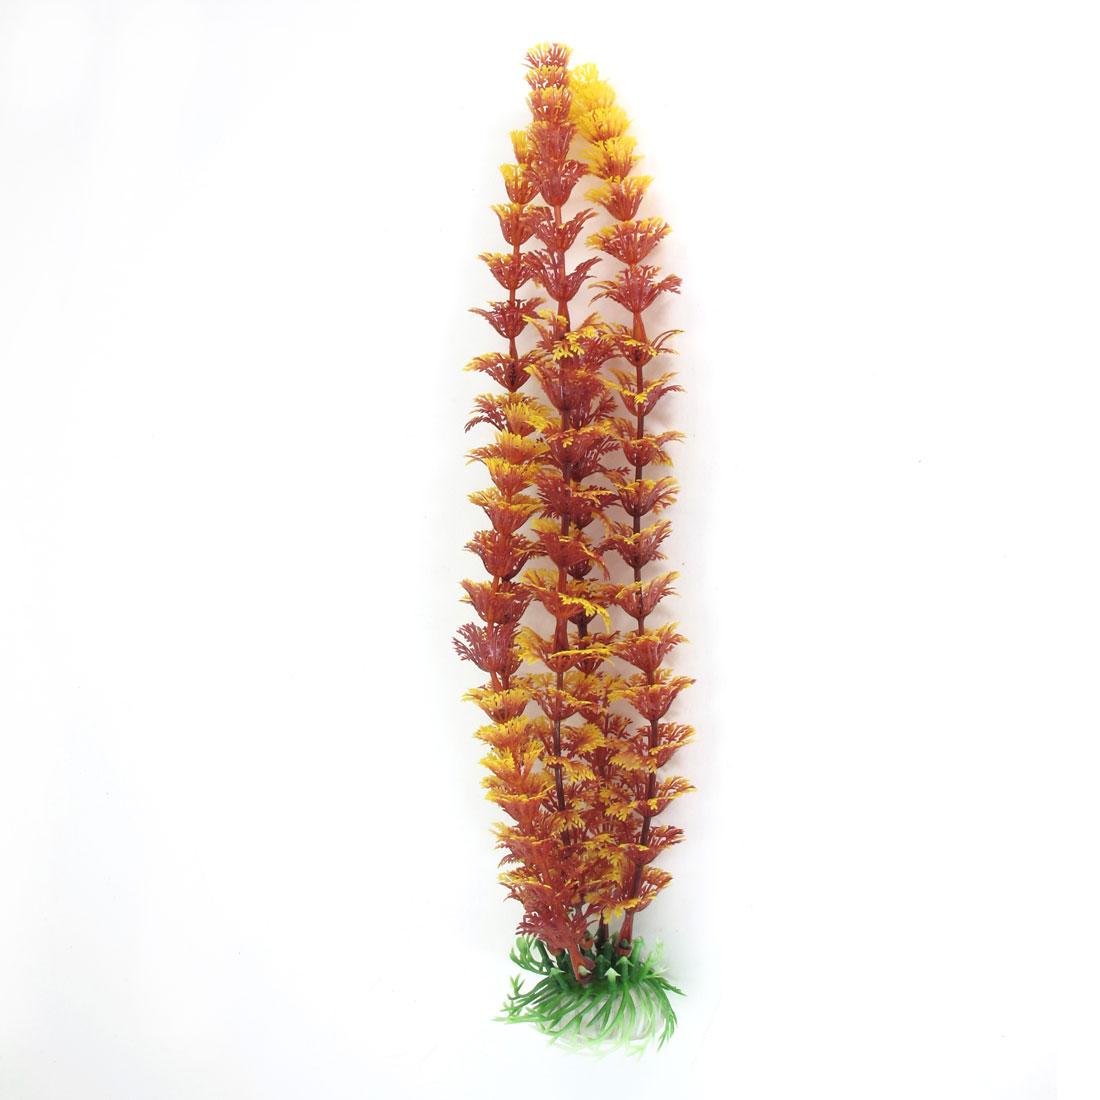 31cm High Ceramic Base Burgundy Plastic Plant Water Grass for Fishbowl Aquarium